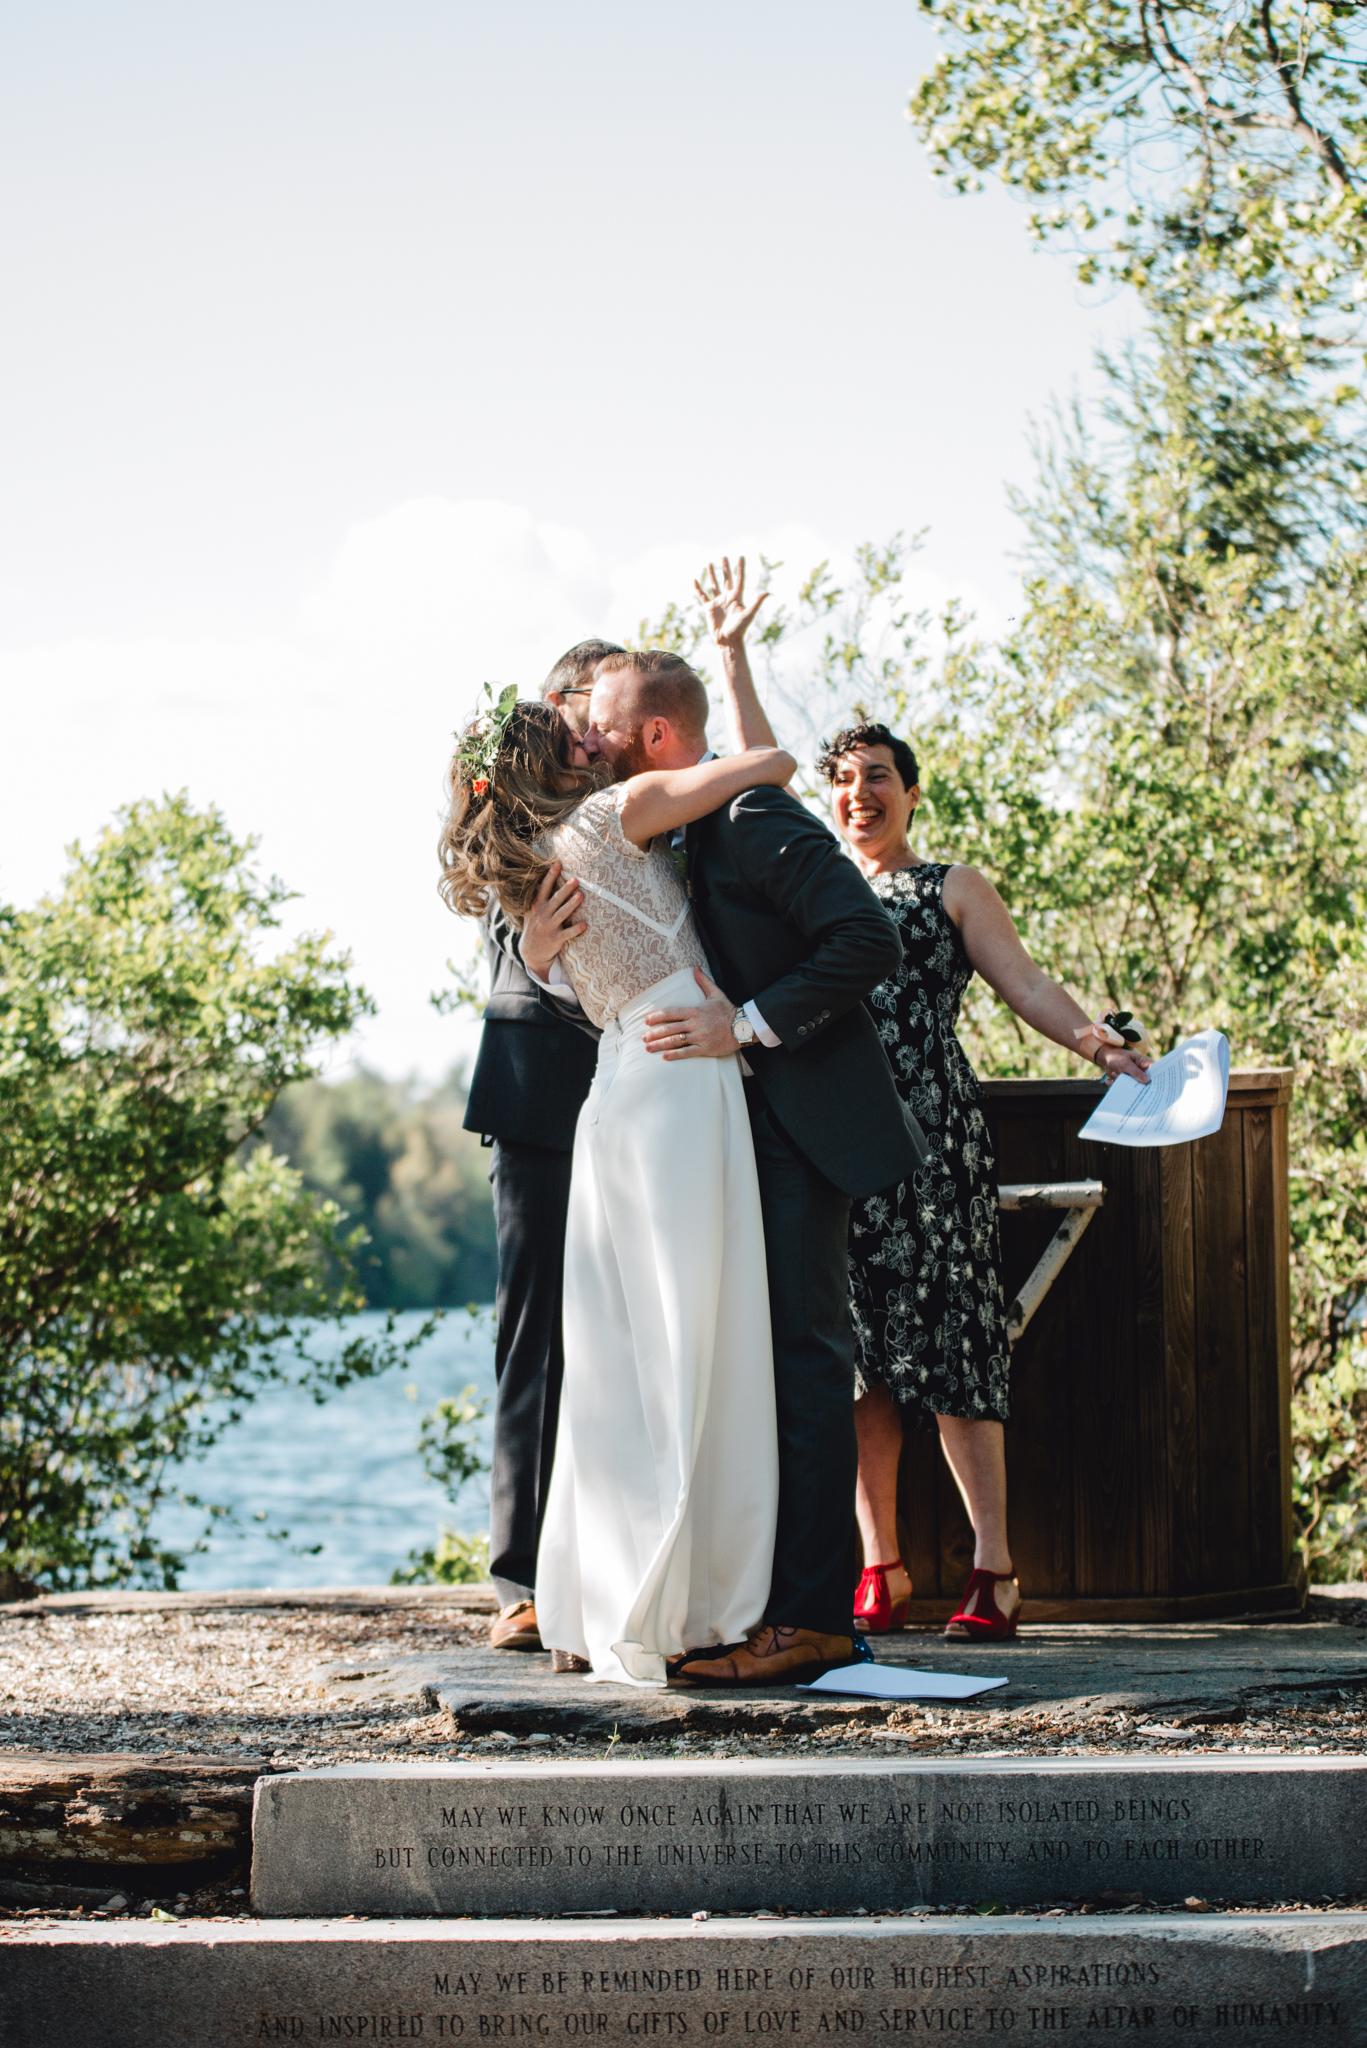 Summer Camp Wedding Photography June 2017 Massachusetts Berkshires Outdoor Wedding Photography Novella Photography Matt and Paulette Griswold (109).jpg